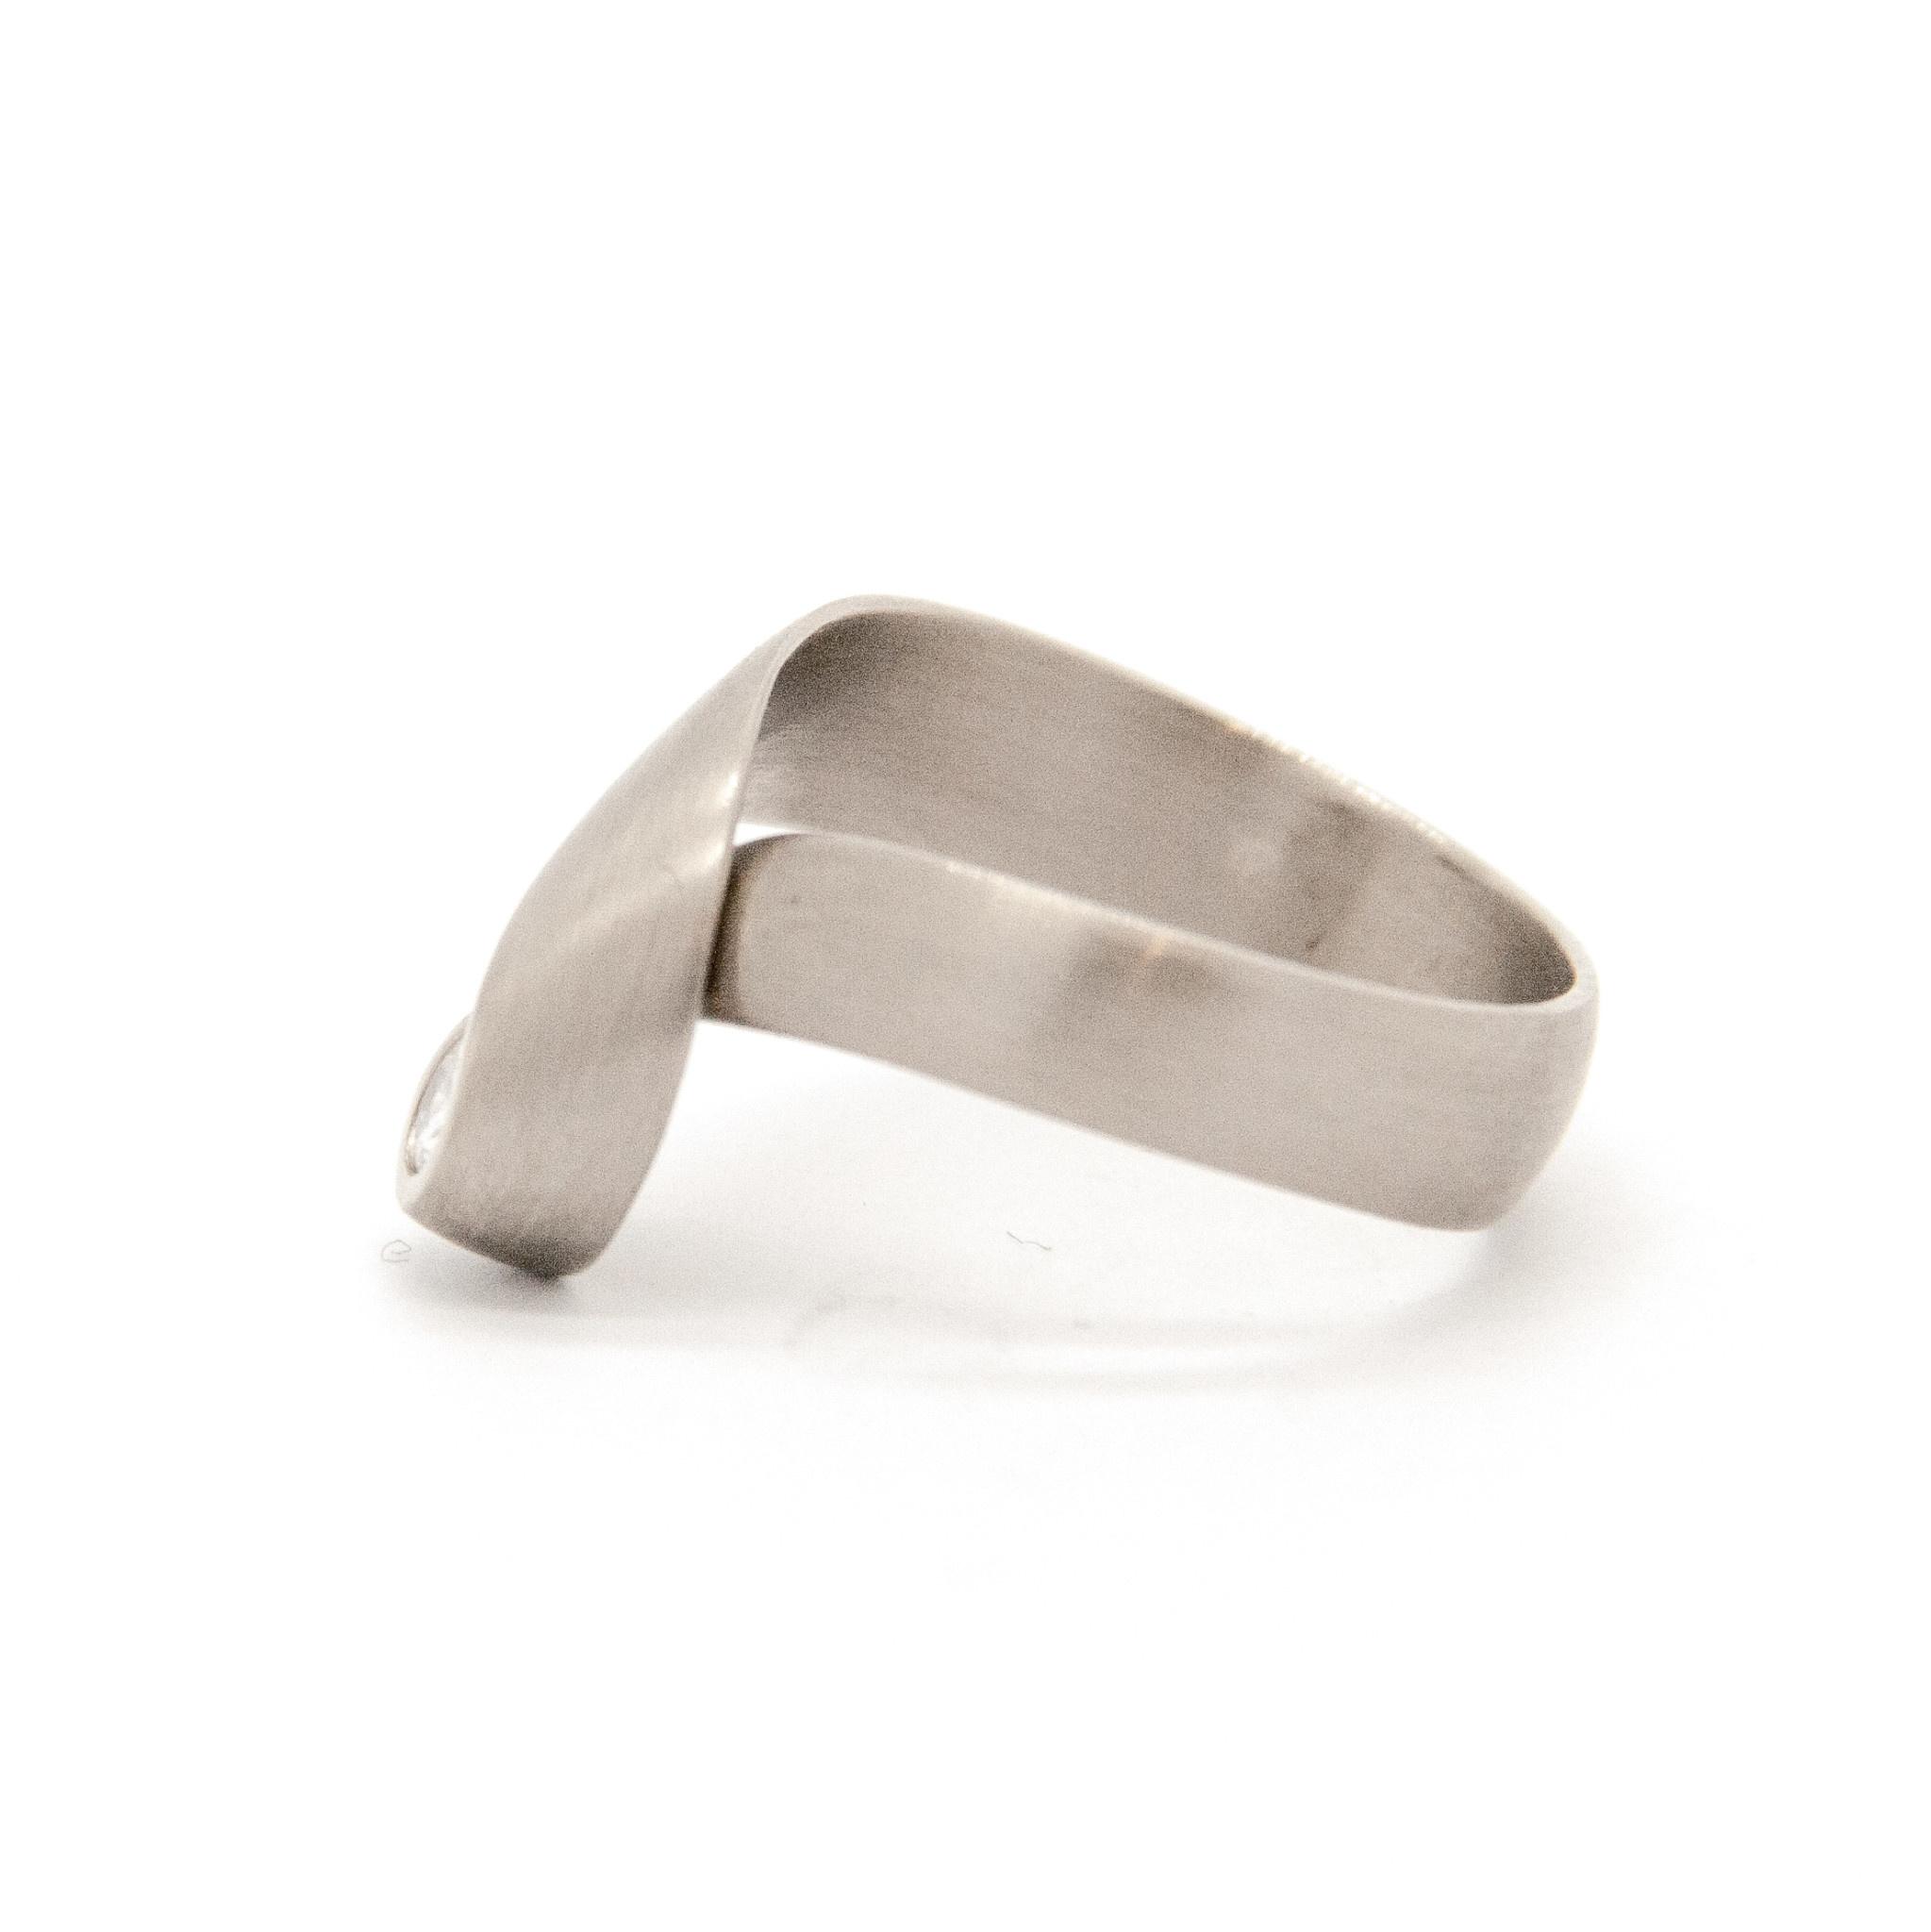 14k white gold ring size 56-4